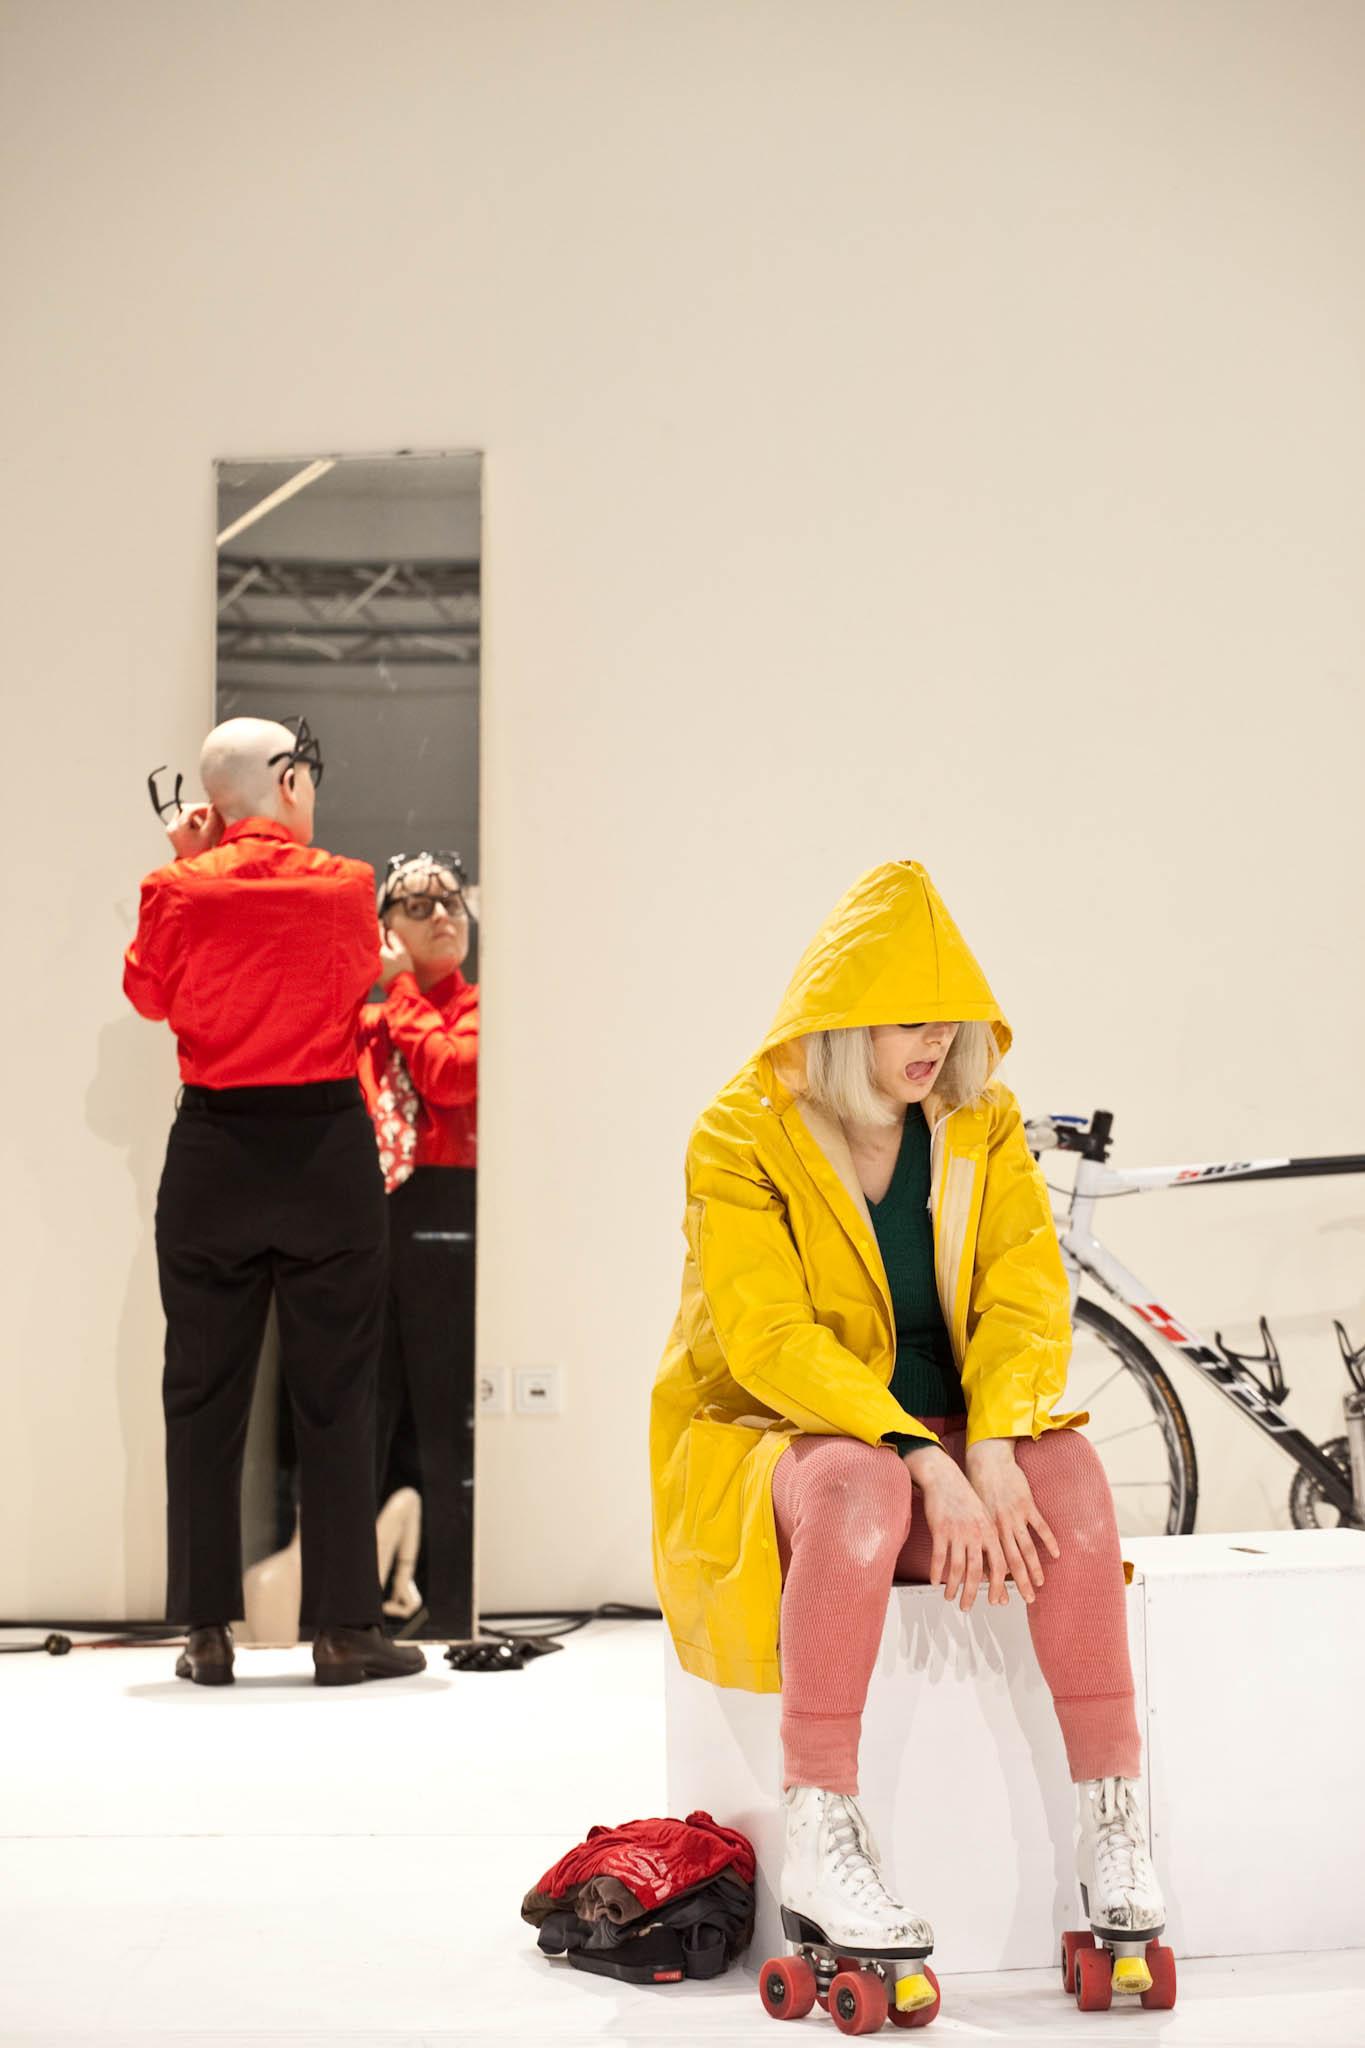 Scaroni, in wig, slicker, and skates, sits slumped, mouth agape. In background, Markland adjusts glasses in mirror. (photo: Sven Hagolani)